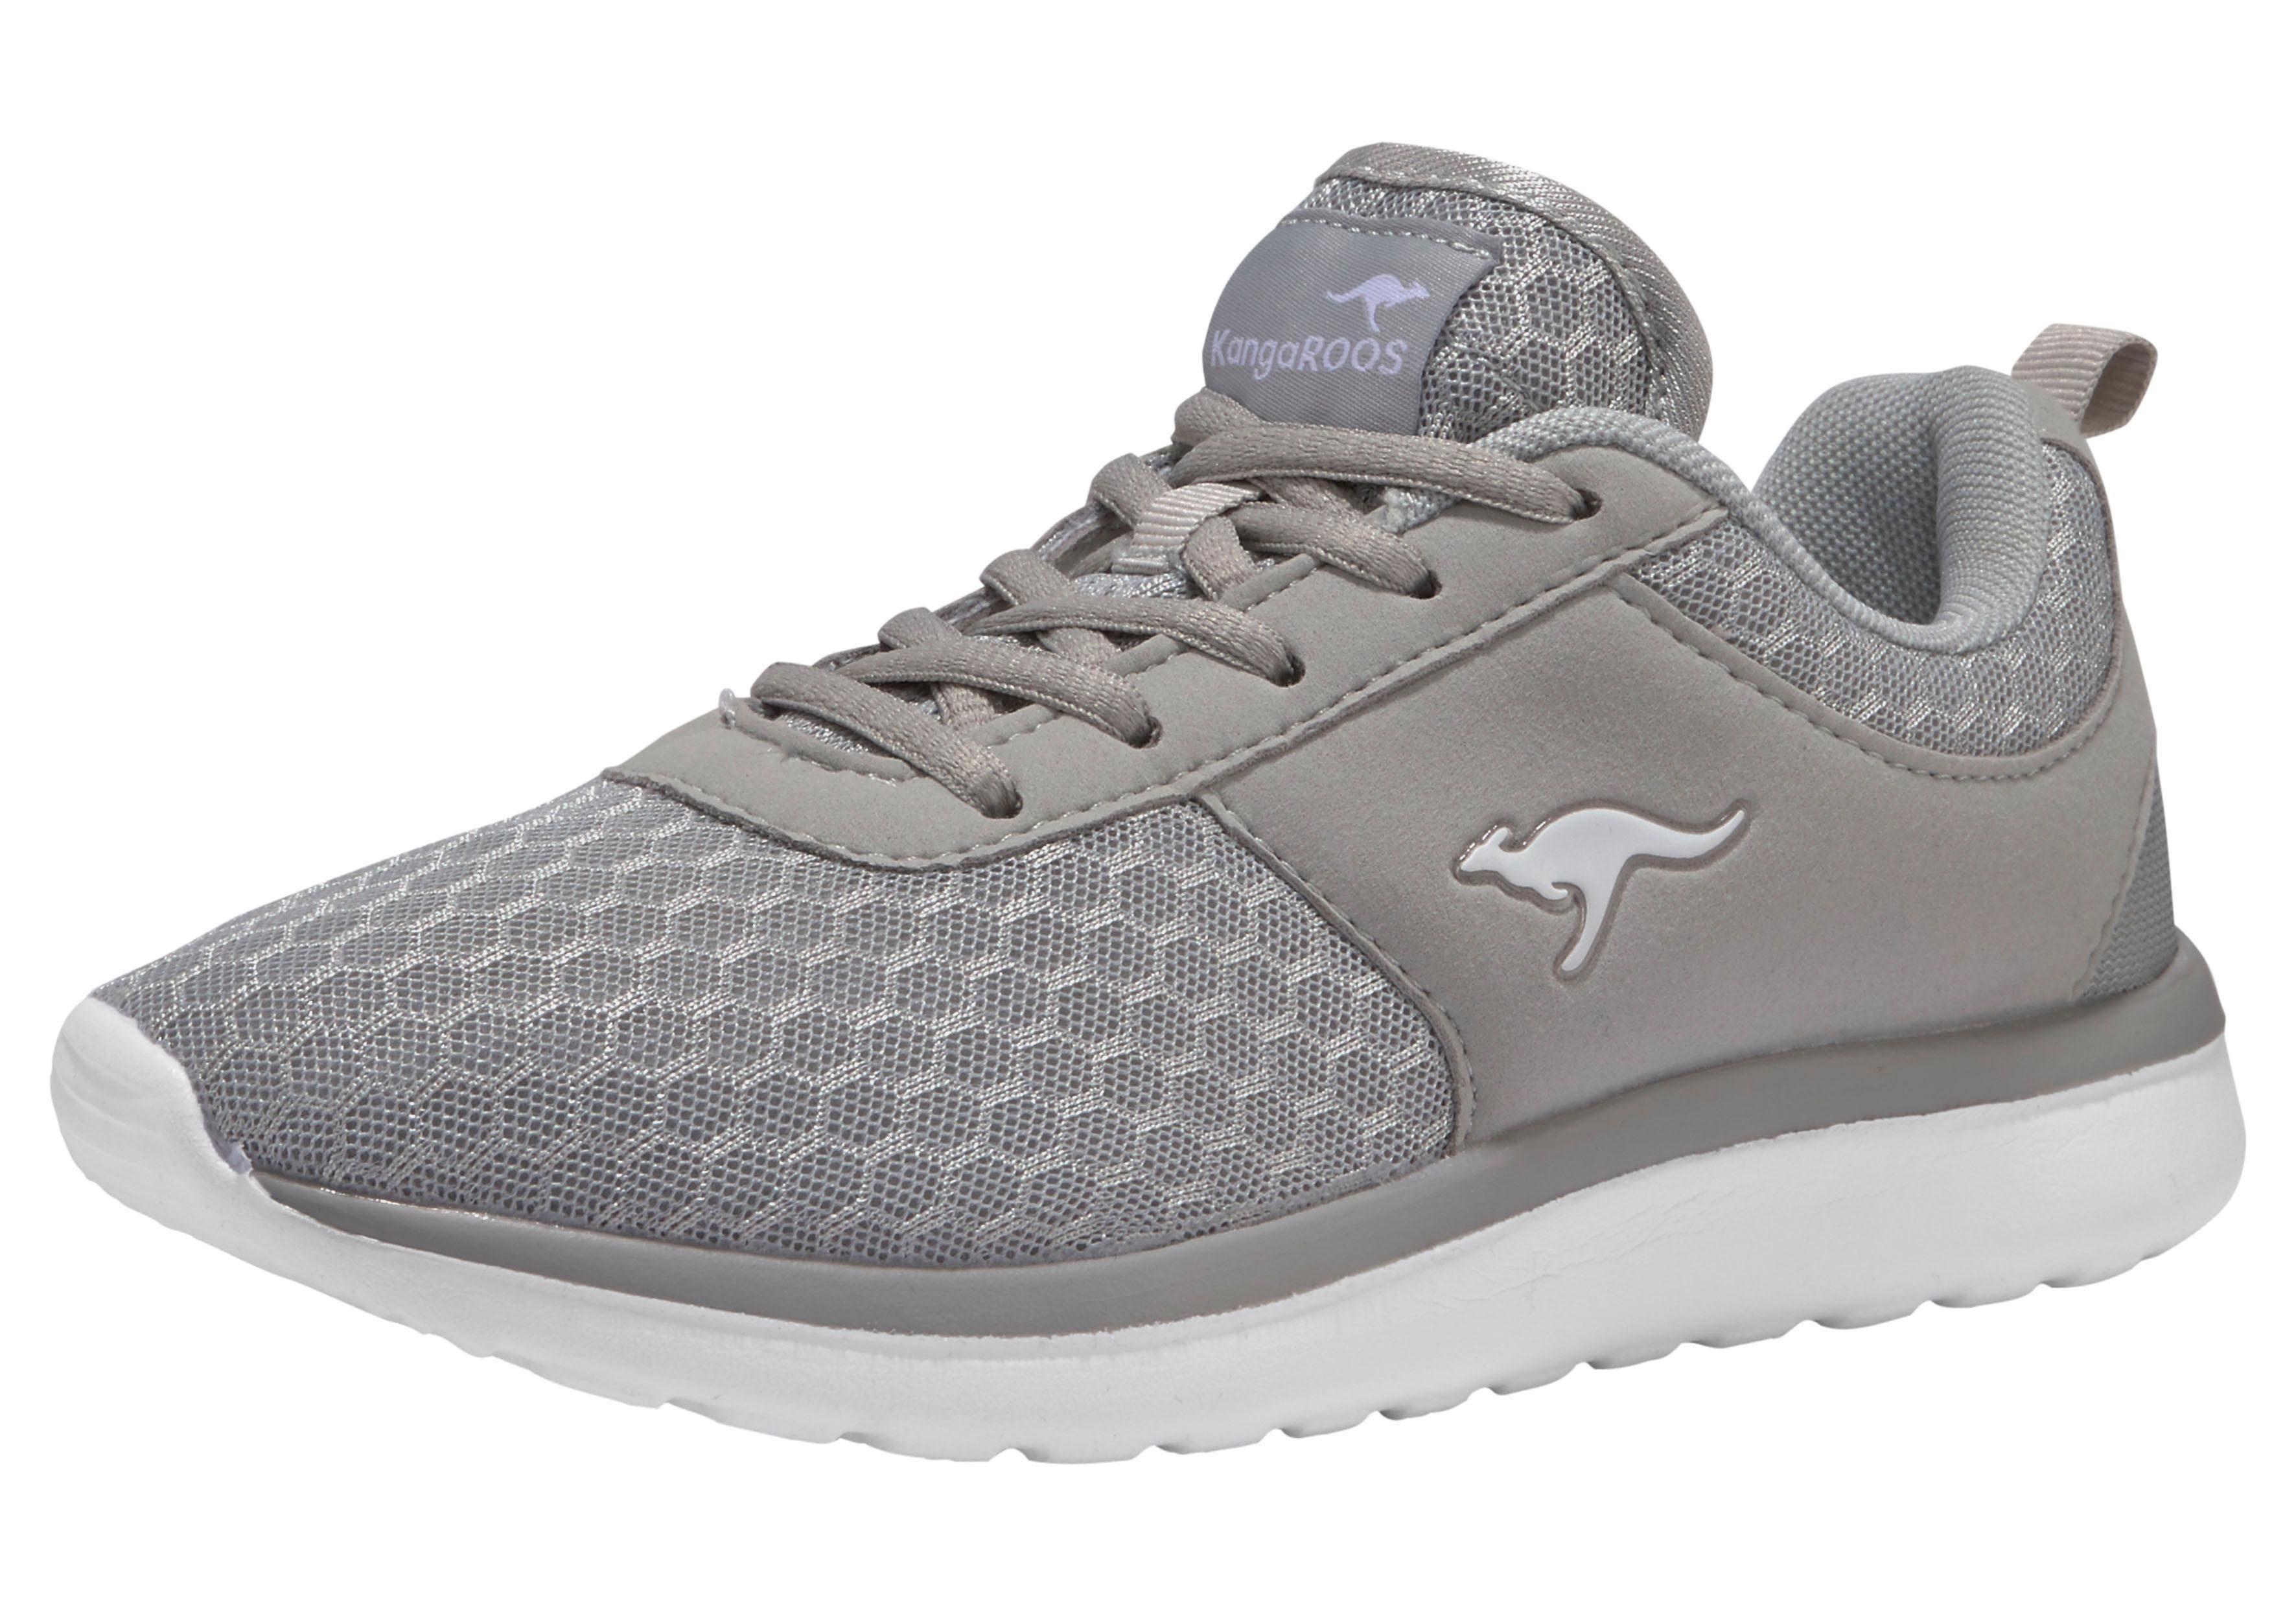 KaufenOtto »bumpy« Online Online Kangaroos »bumpy« Kangaroos Sneaker Sneaker bgyYf6I7v